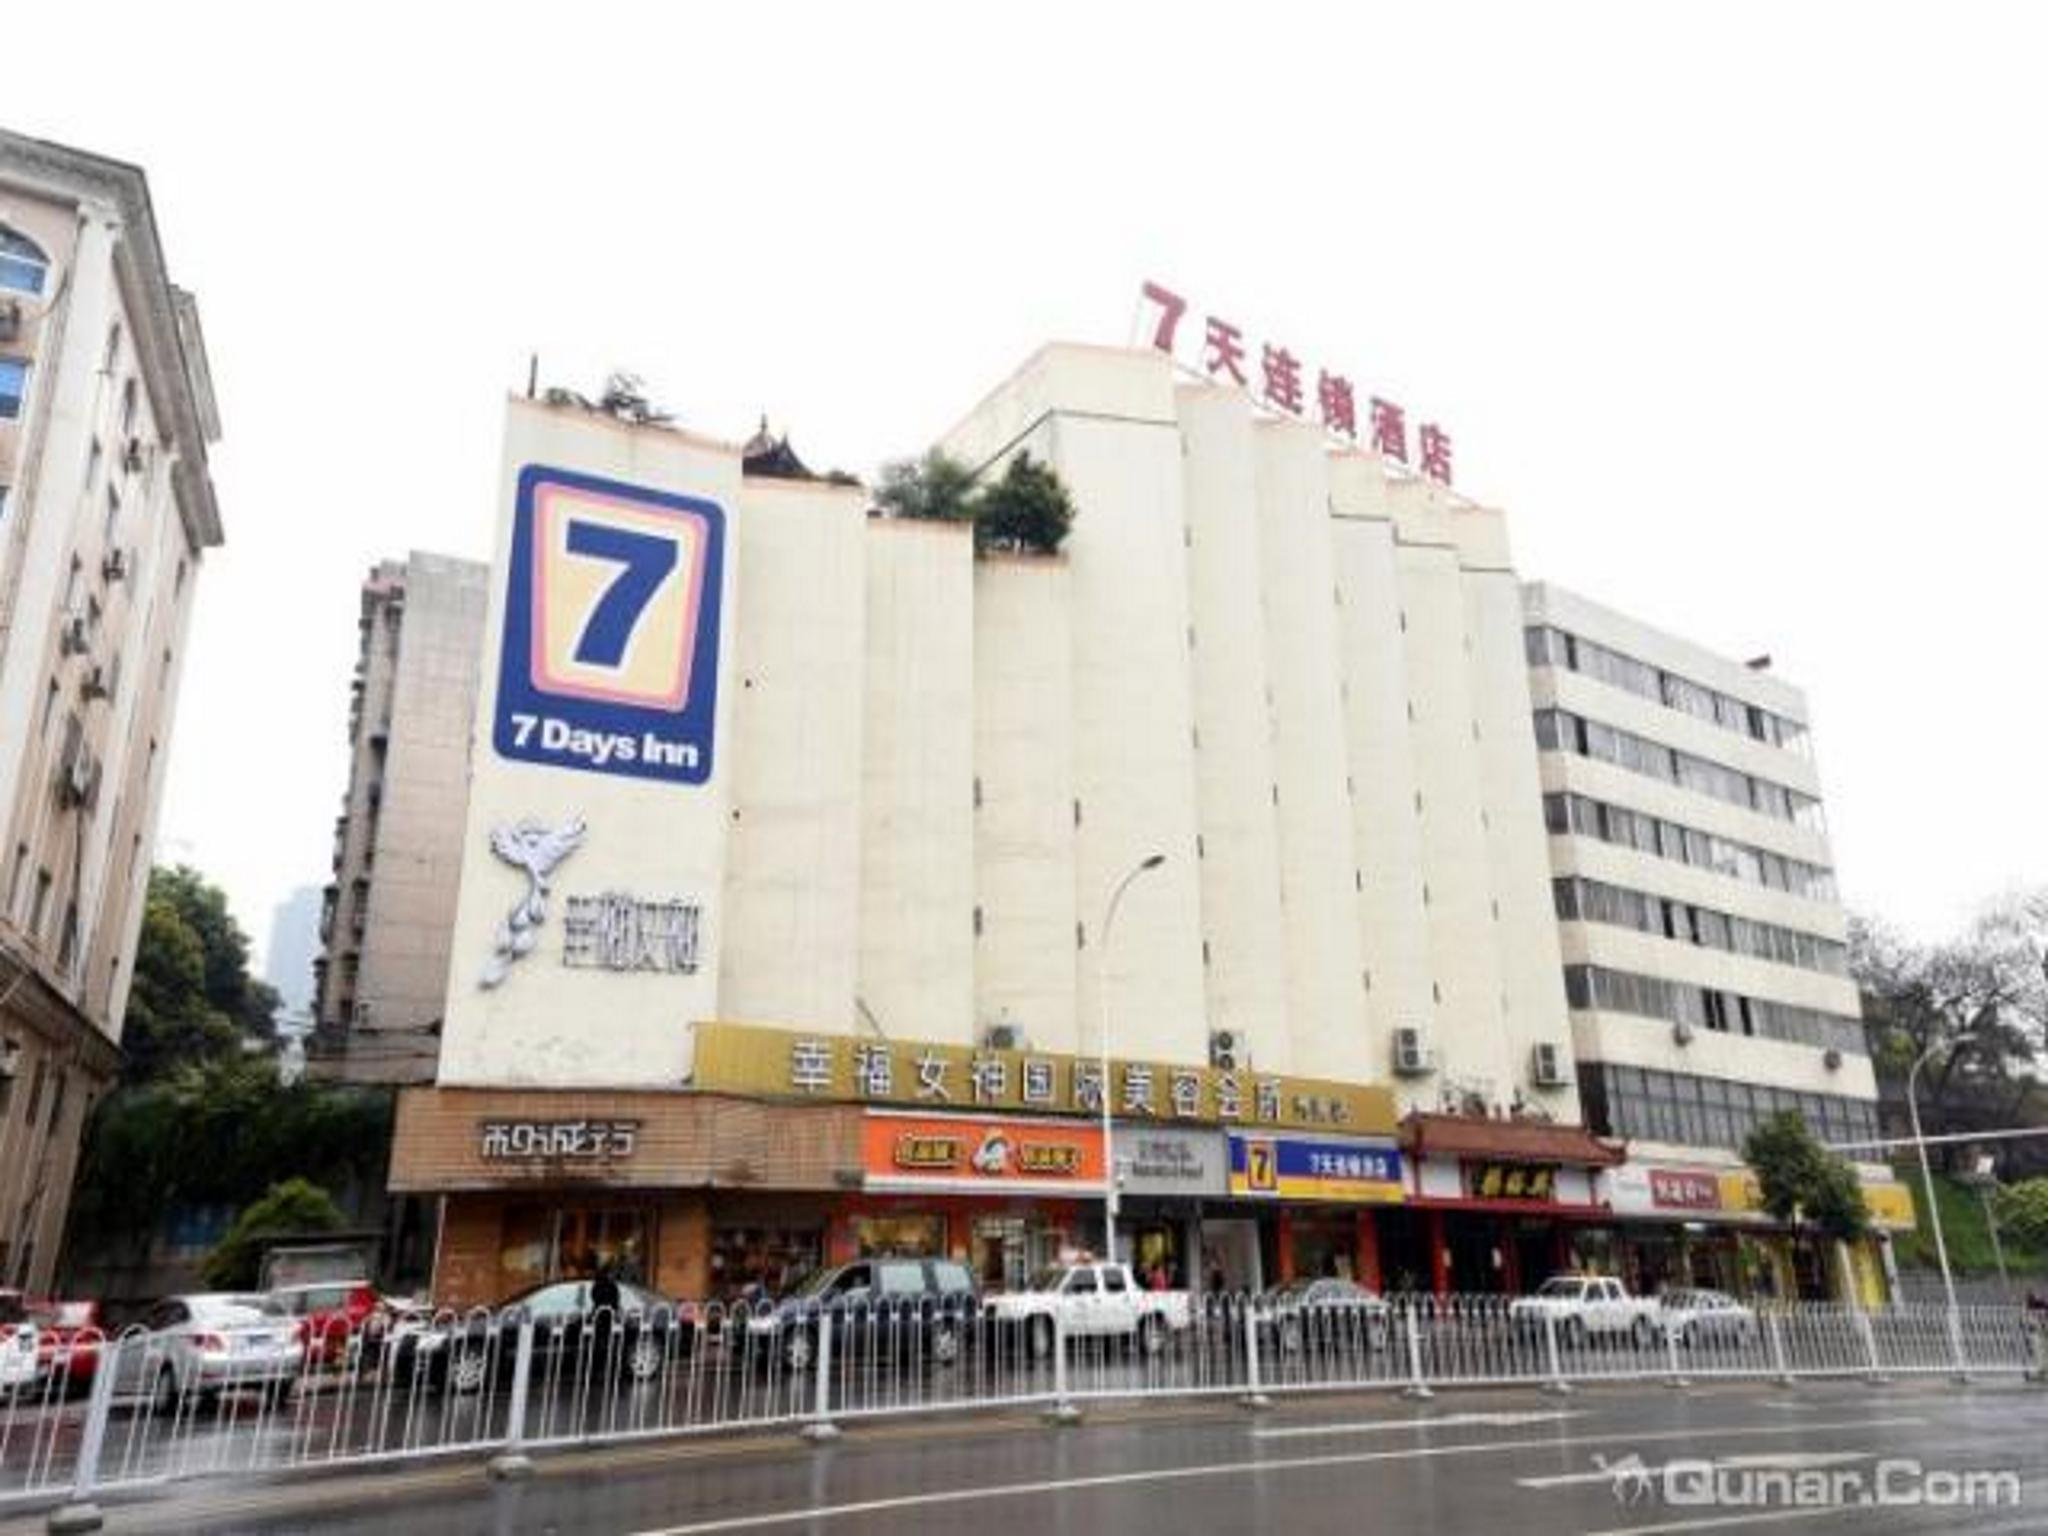 7 Days Inn Changsha Yinpenling Aokesi Square Branch